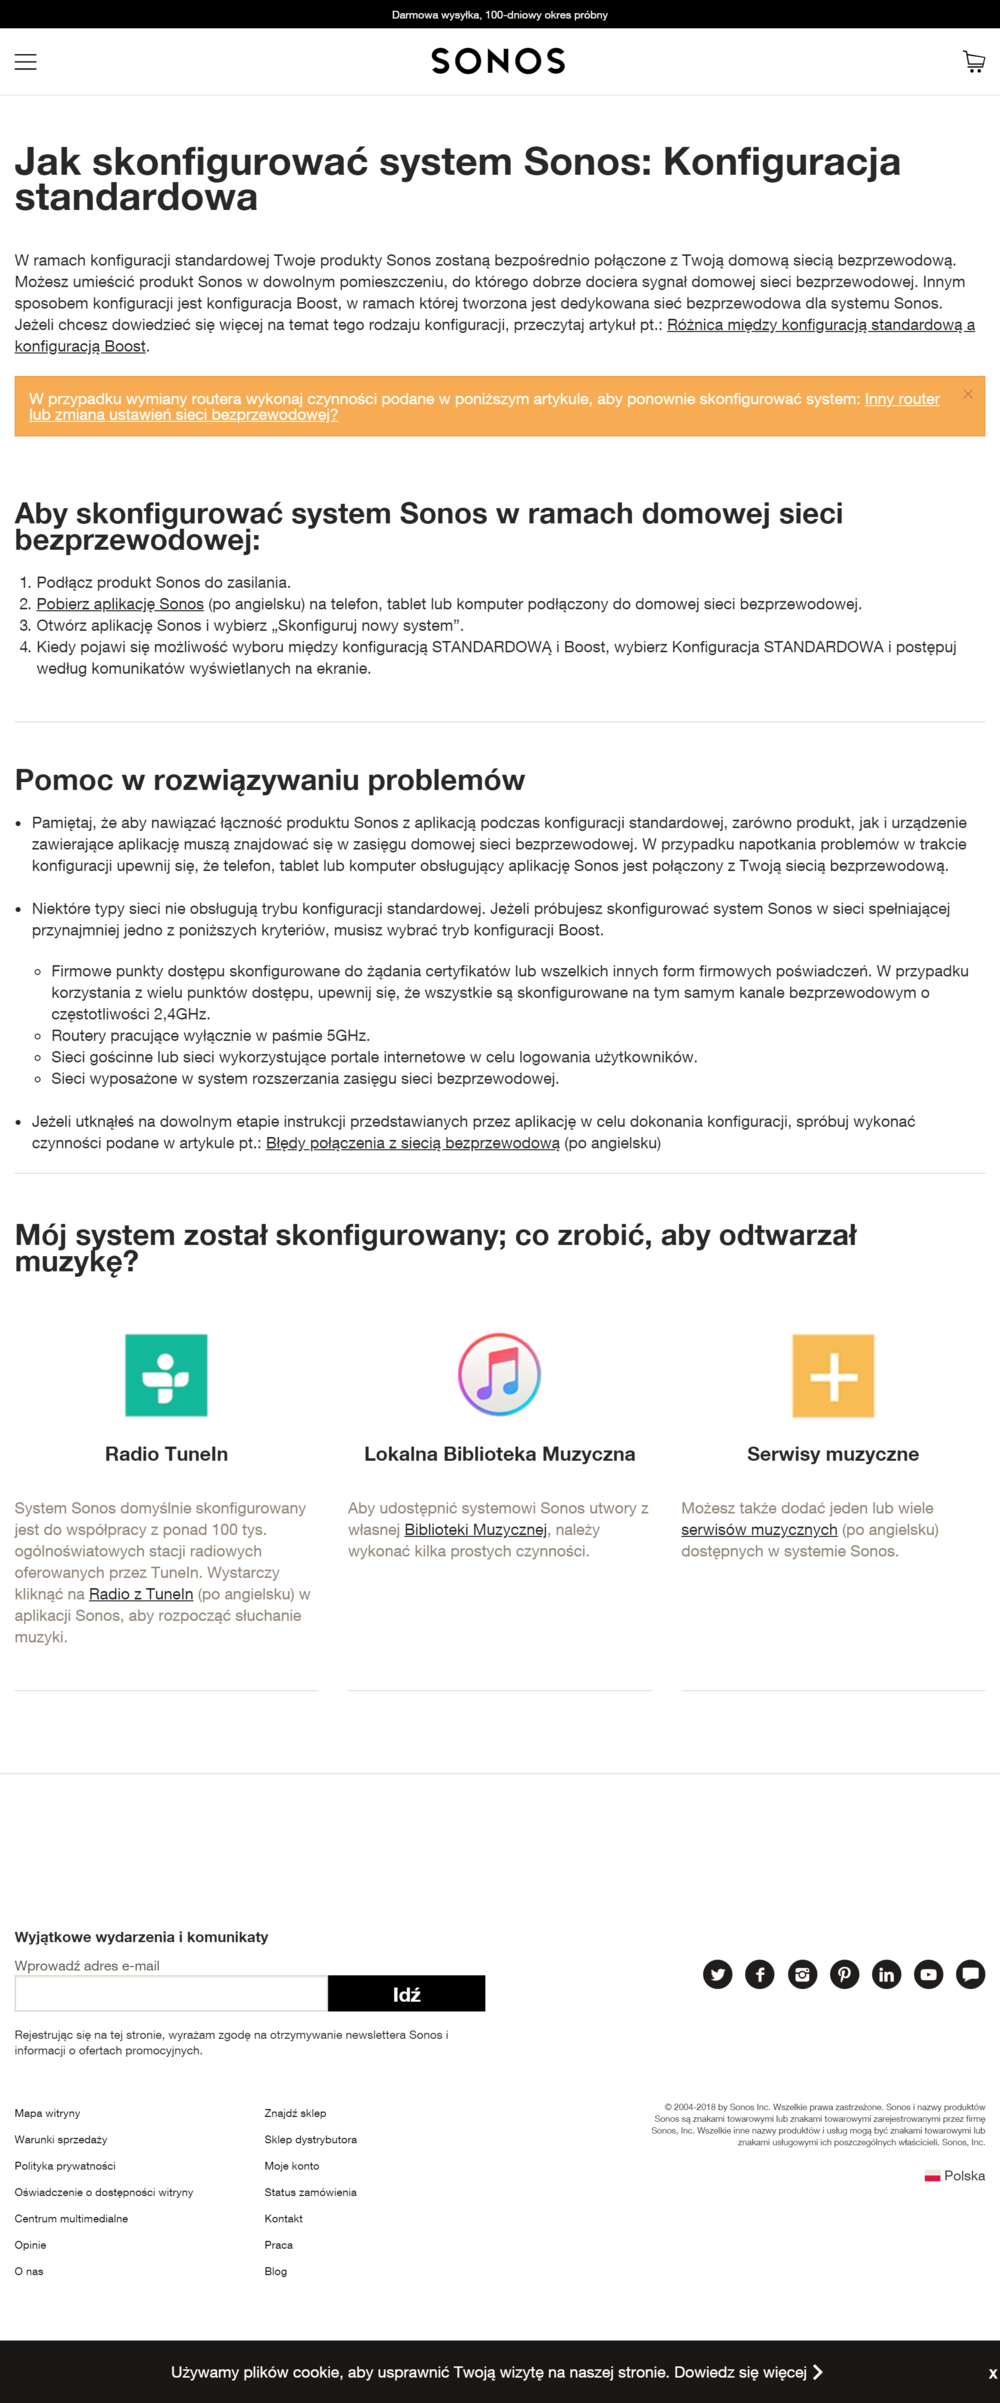 www.sonos.com_pl-pl_support_set-up-sonos(iPad Pro).png